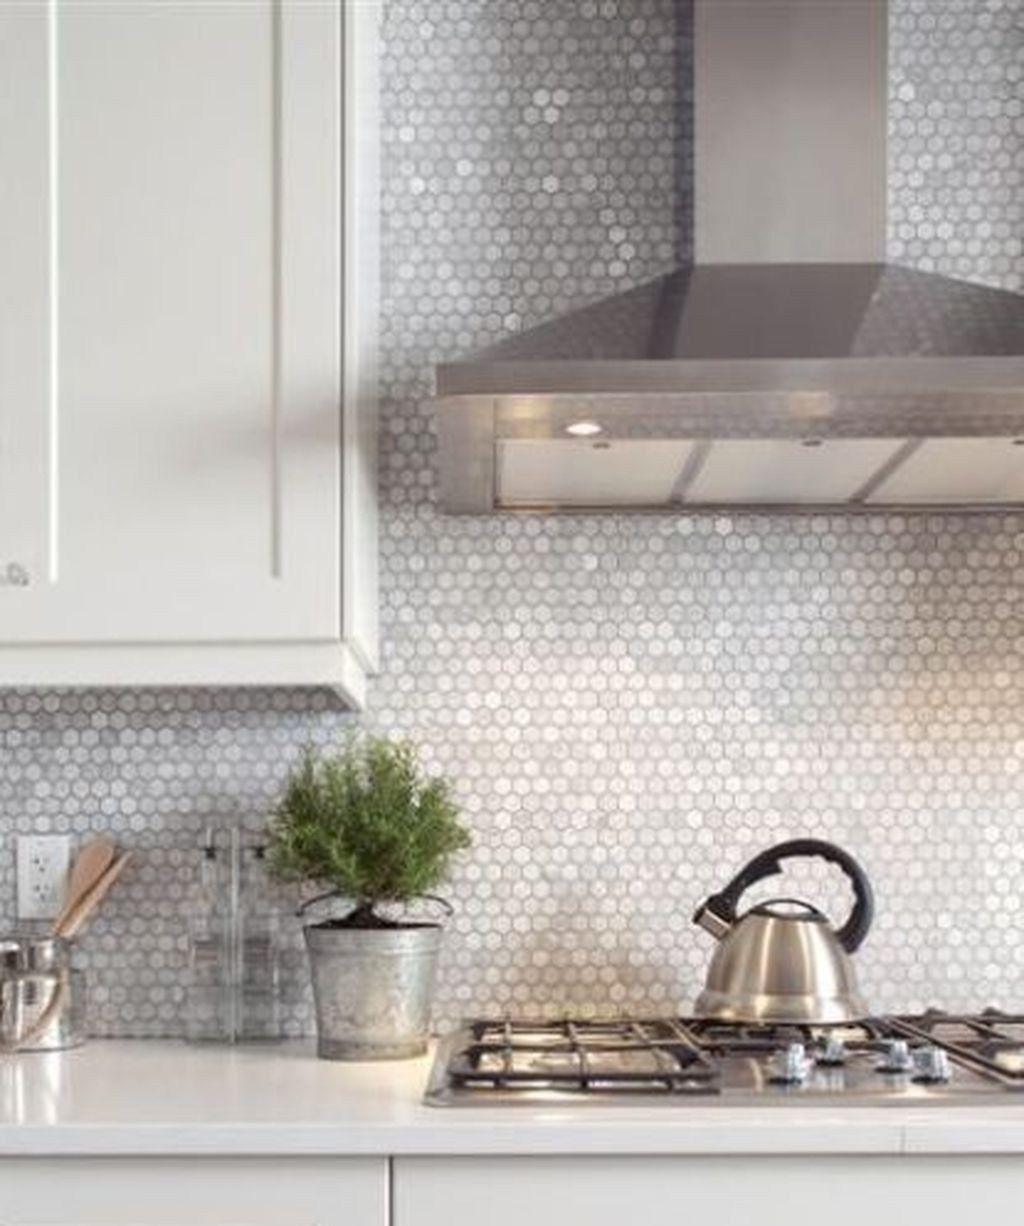 Decoomo Trends Home Decoration Ideas Kitchen Backsplash Photos Marble Tile Backsplash Kitchen Kitchen Backsplash Tile Designs